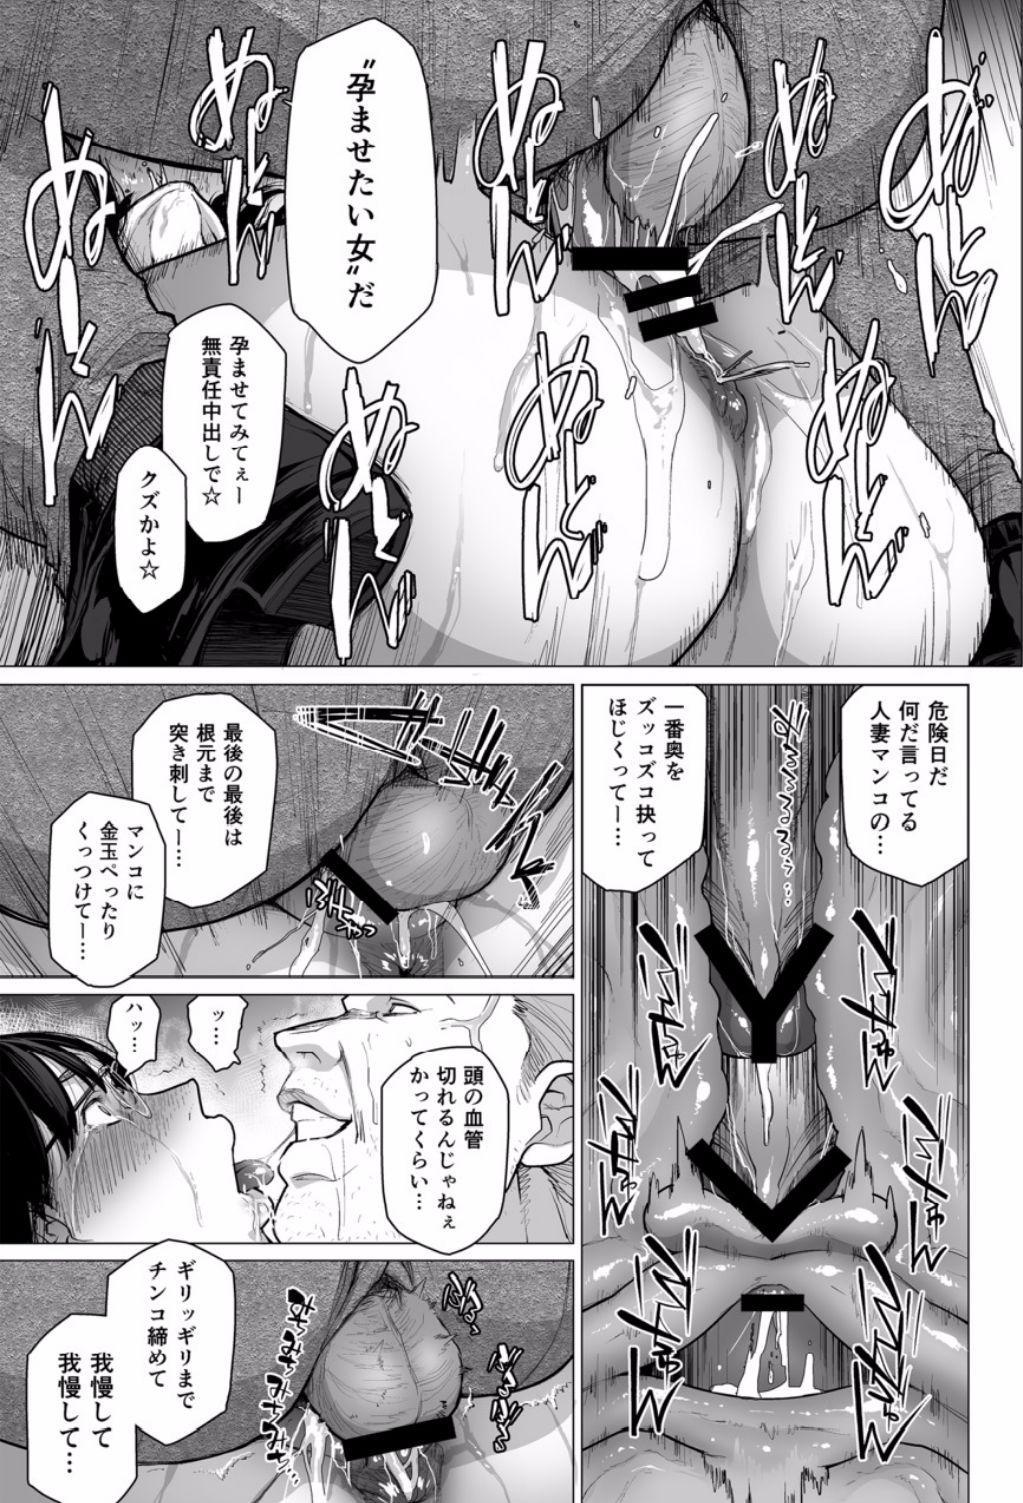 [Etuzan Jakusui] Somerare - Mizu Yari 1-3 56